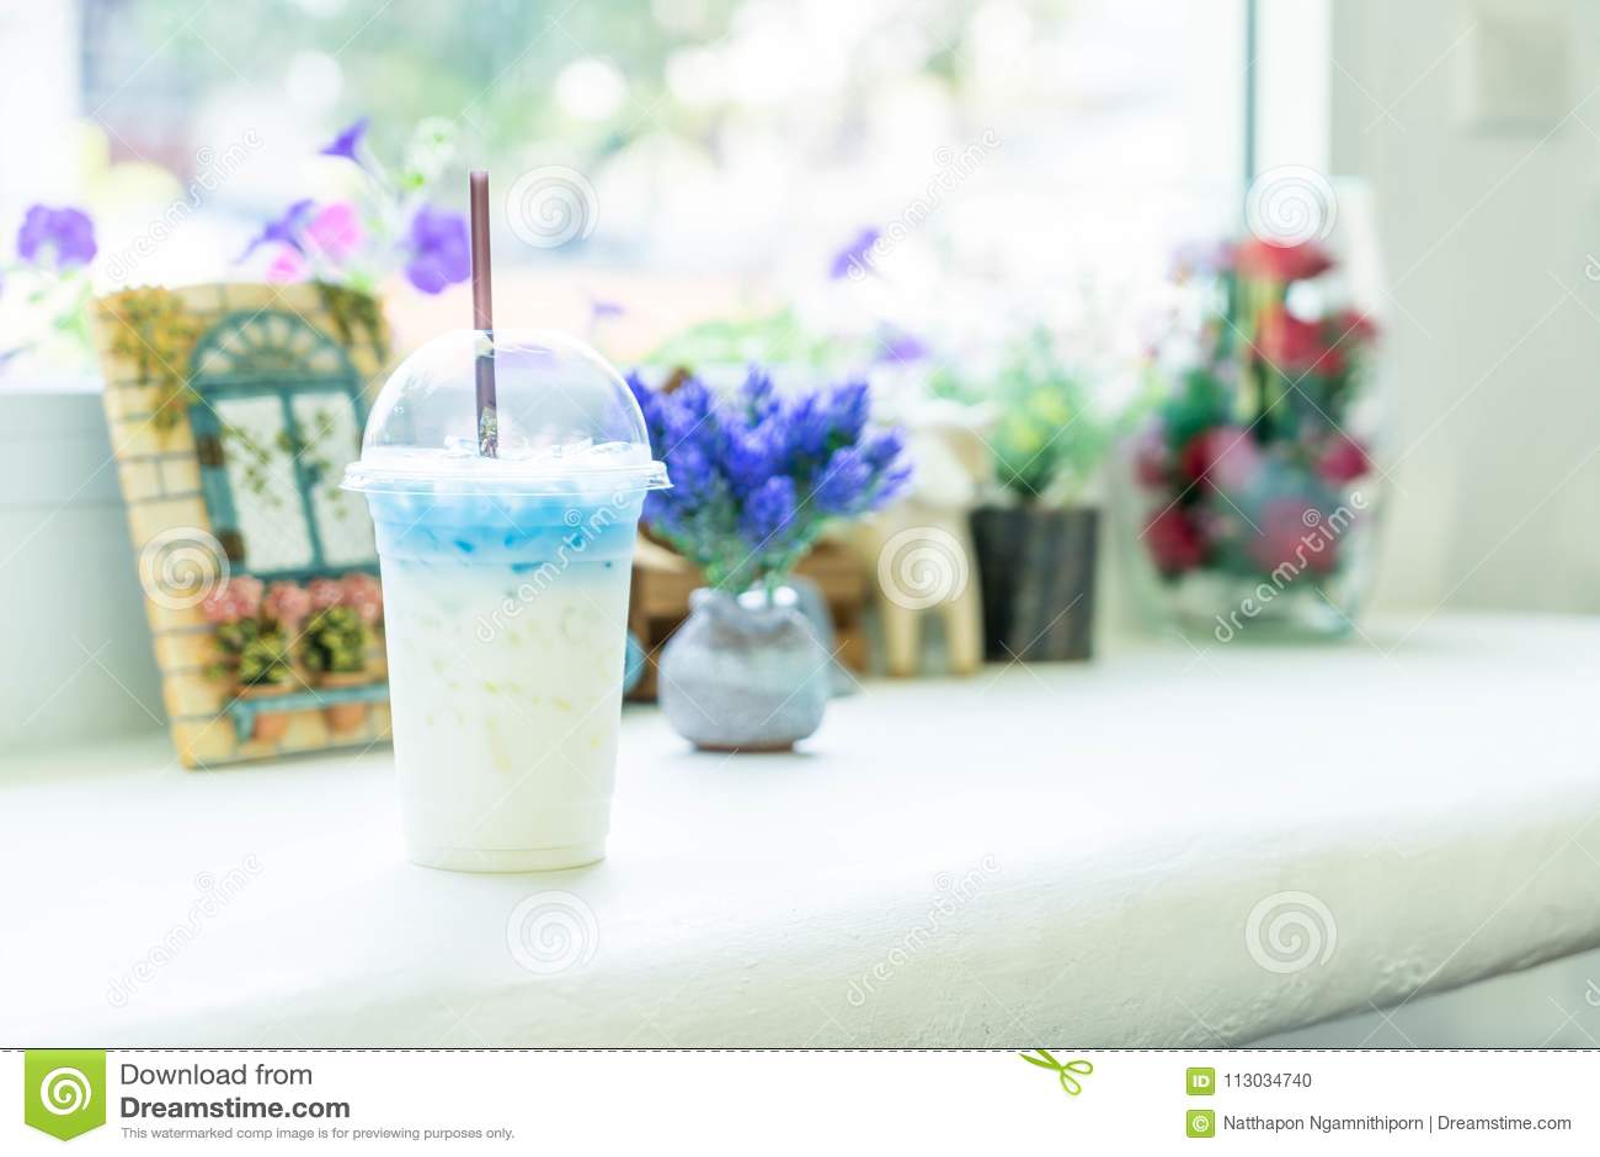 Jugo del guisante de mariposa con leche